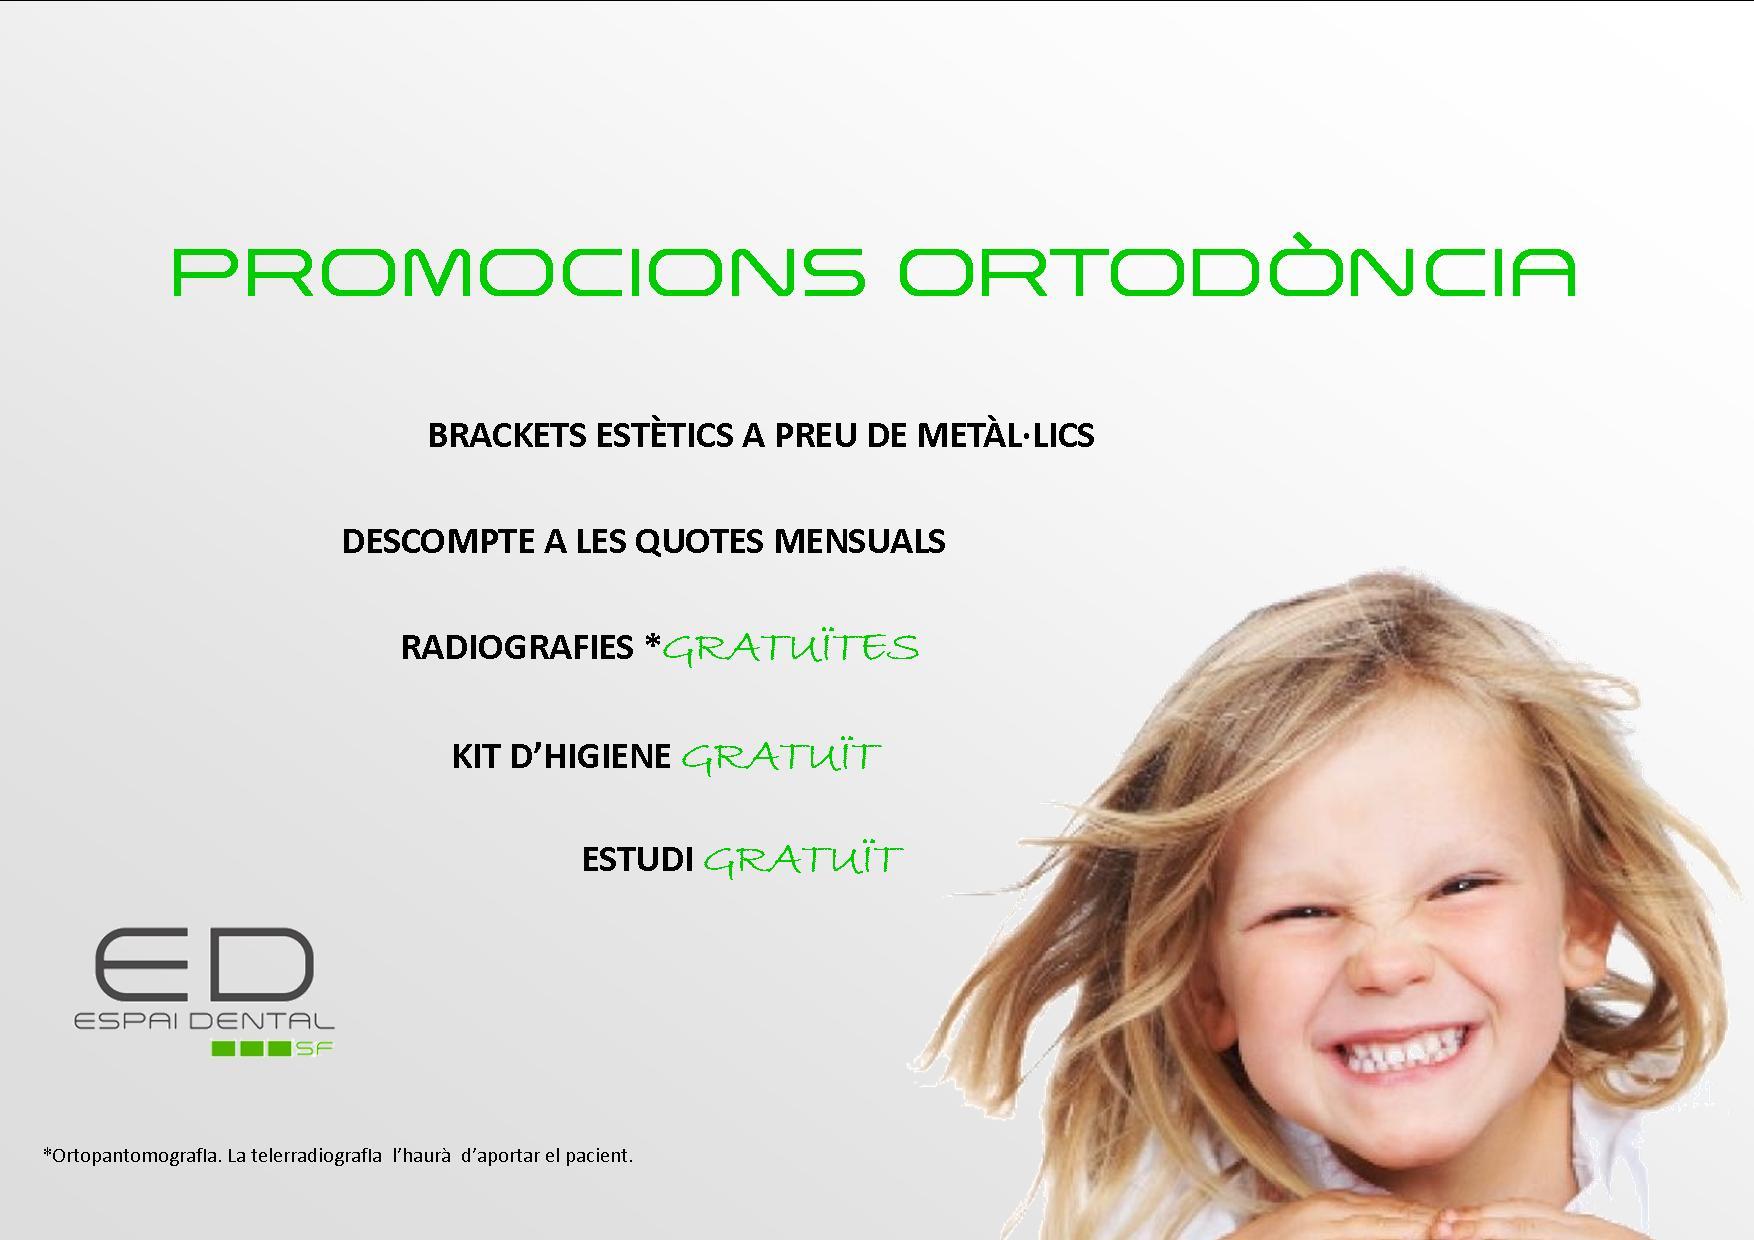 promociones-ortodoncia-cat